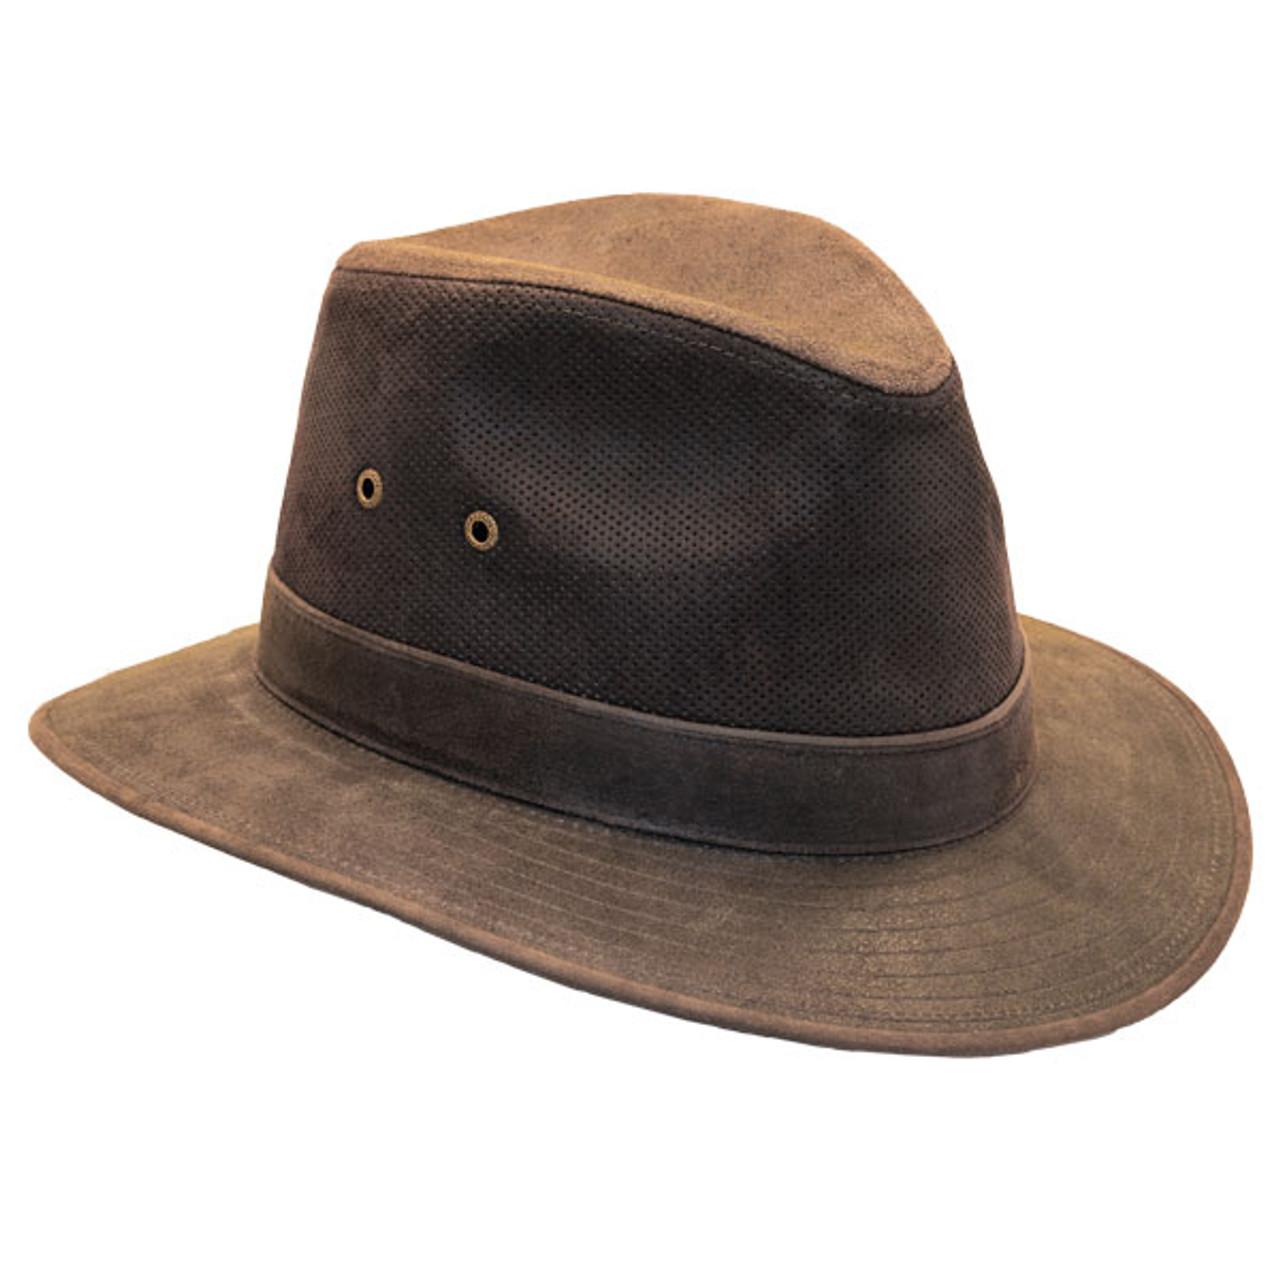 5e6ea78ef4c Previous. Stetson - Tullamore Distressed Leather Safari Hat - Opposite Side